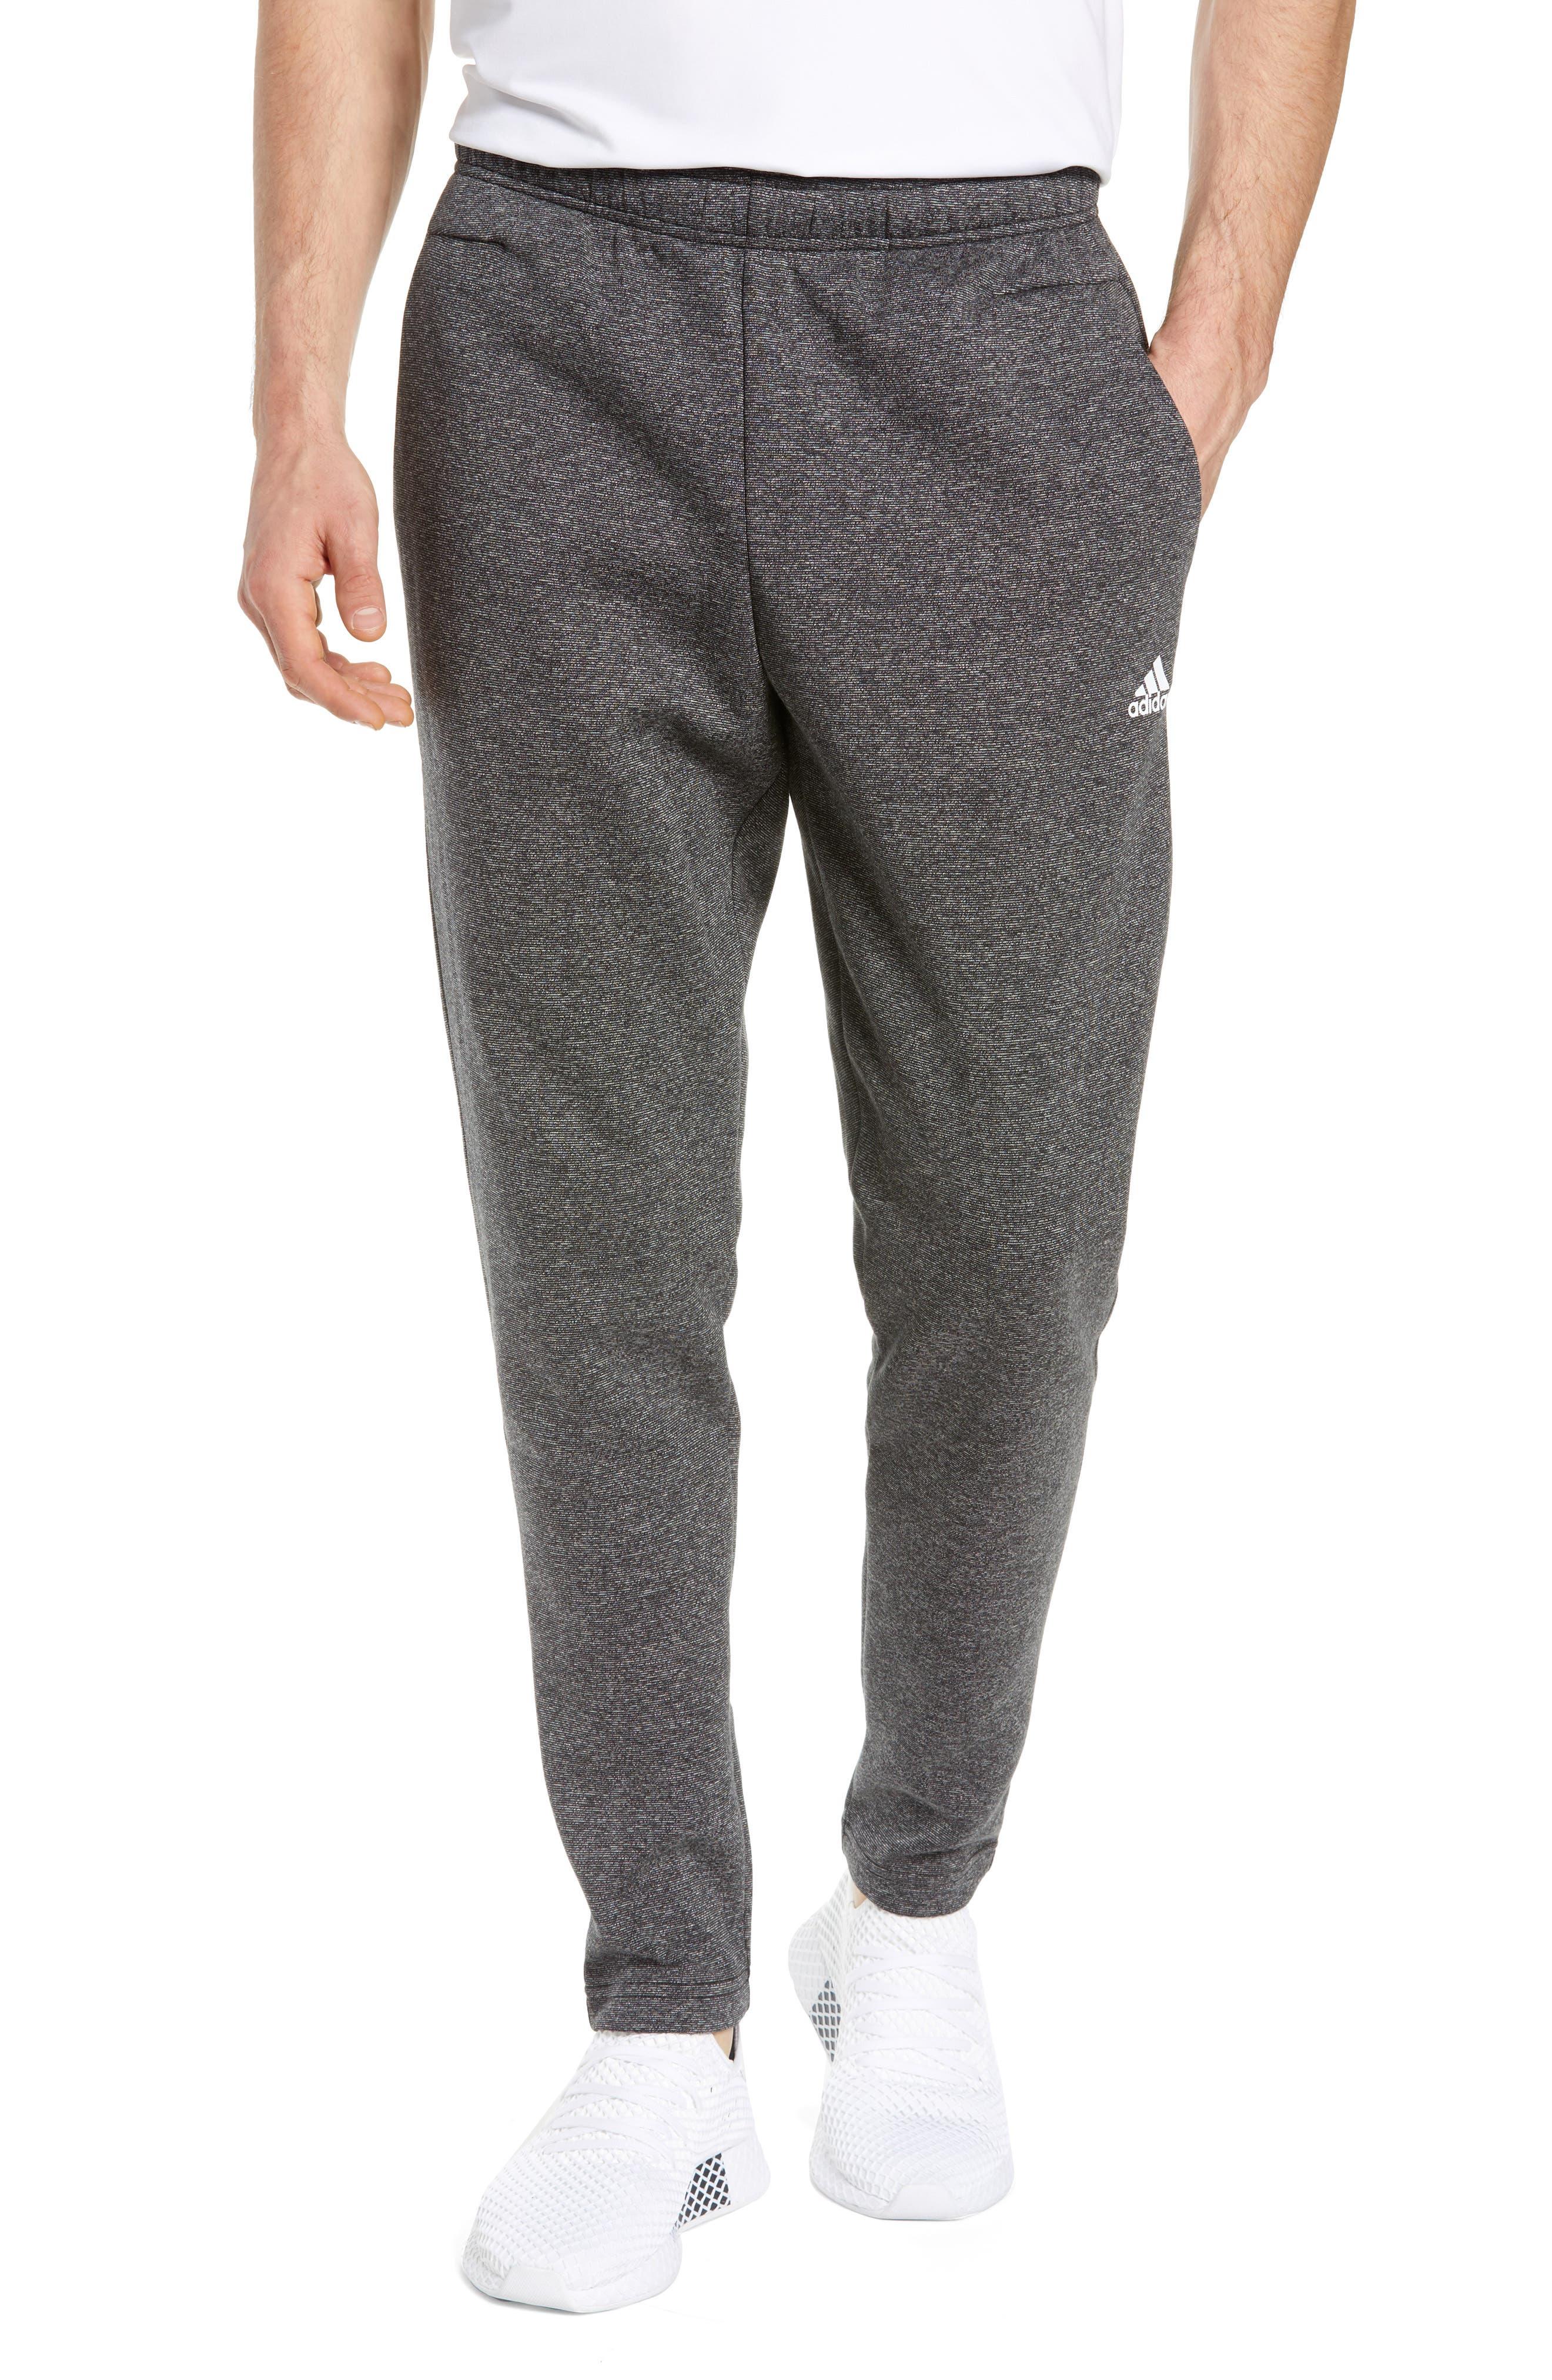 Men's Adidas ID Stadium Knit Pants